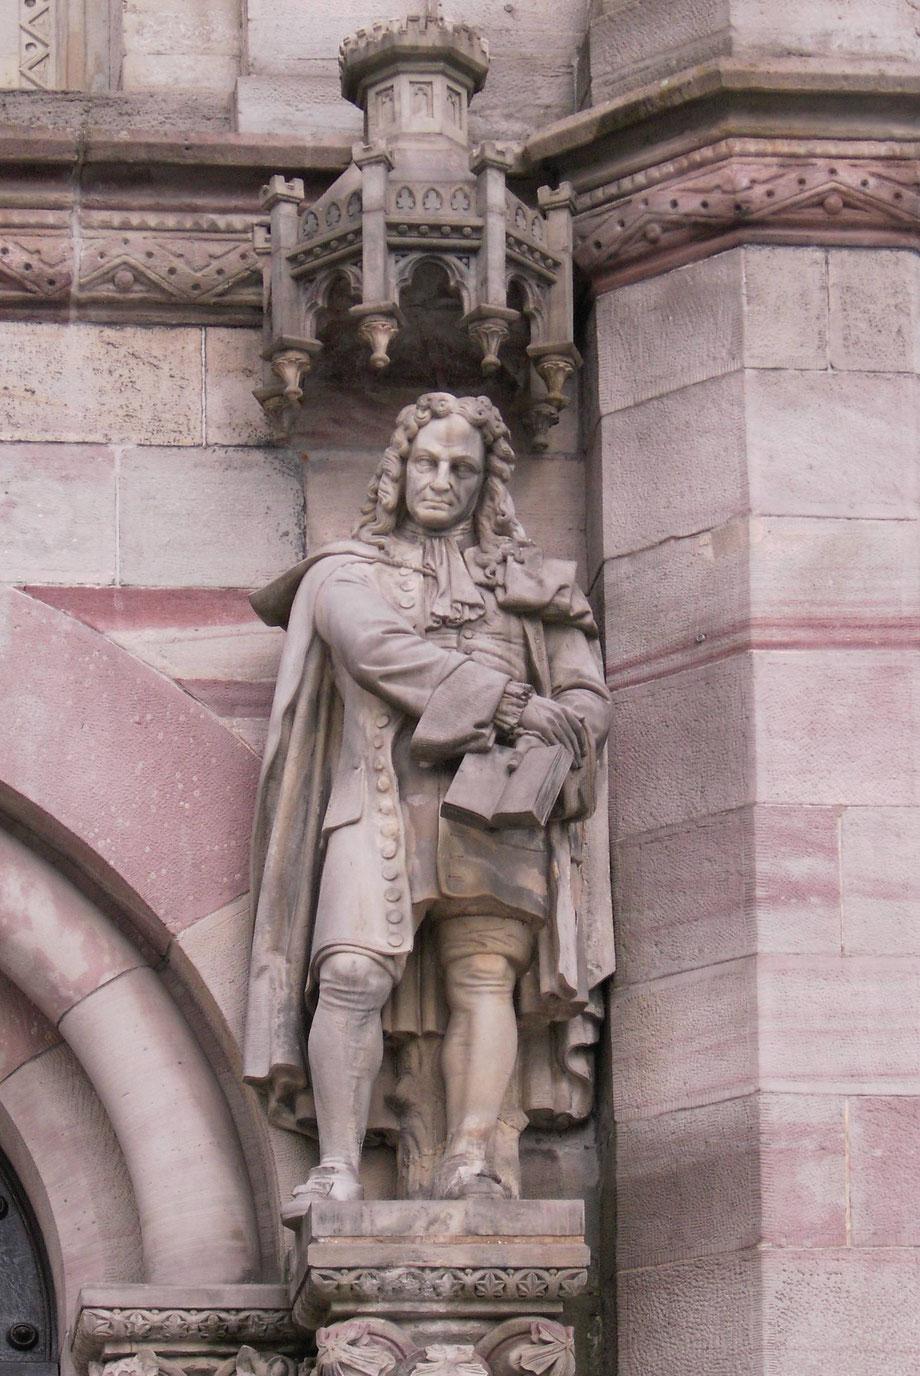 Statua di Gottfried Wilhelm Leibniz a Göttingen (Auditorium)